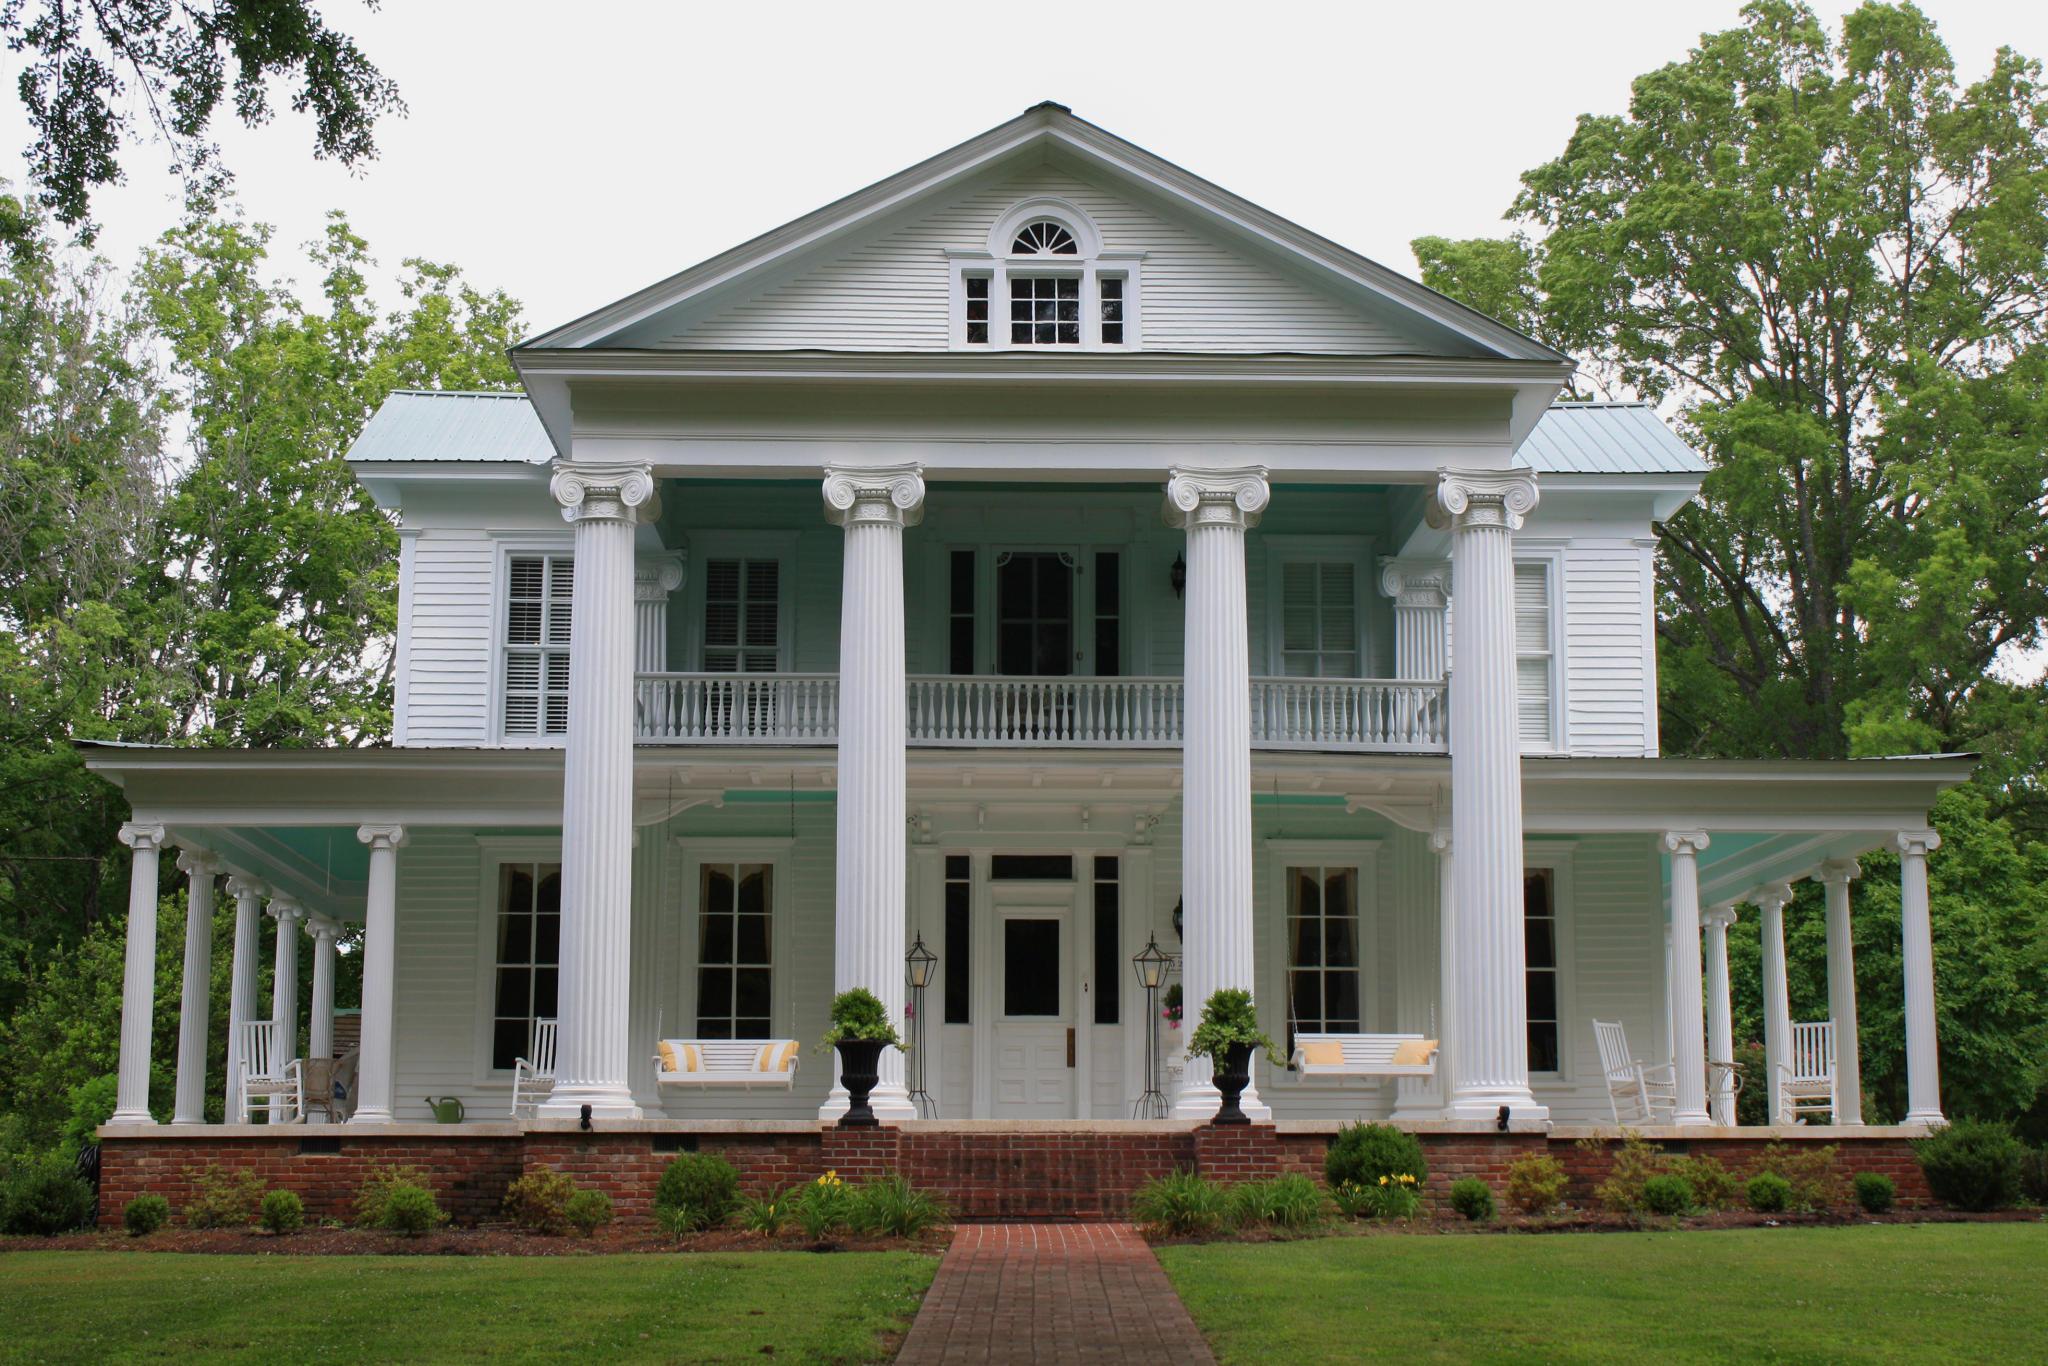 320 College St Savannah TN 38372 Estimate and Home Details